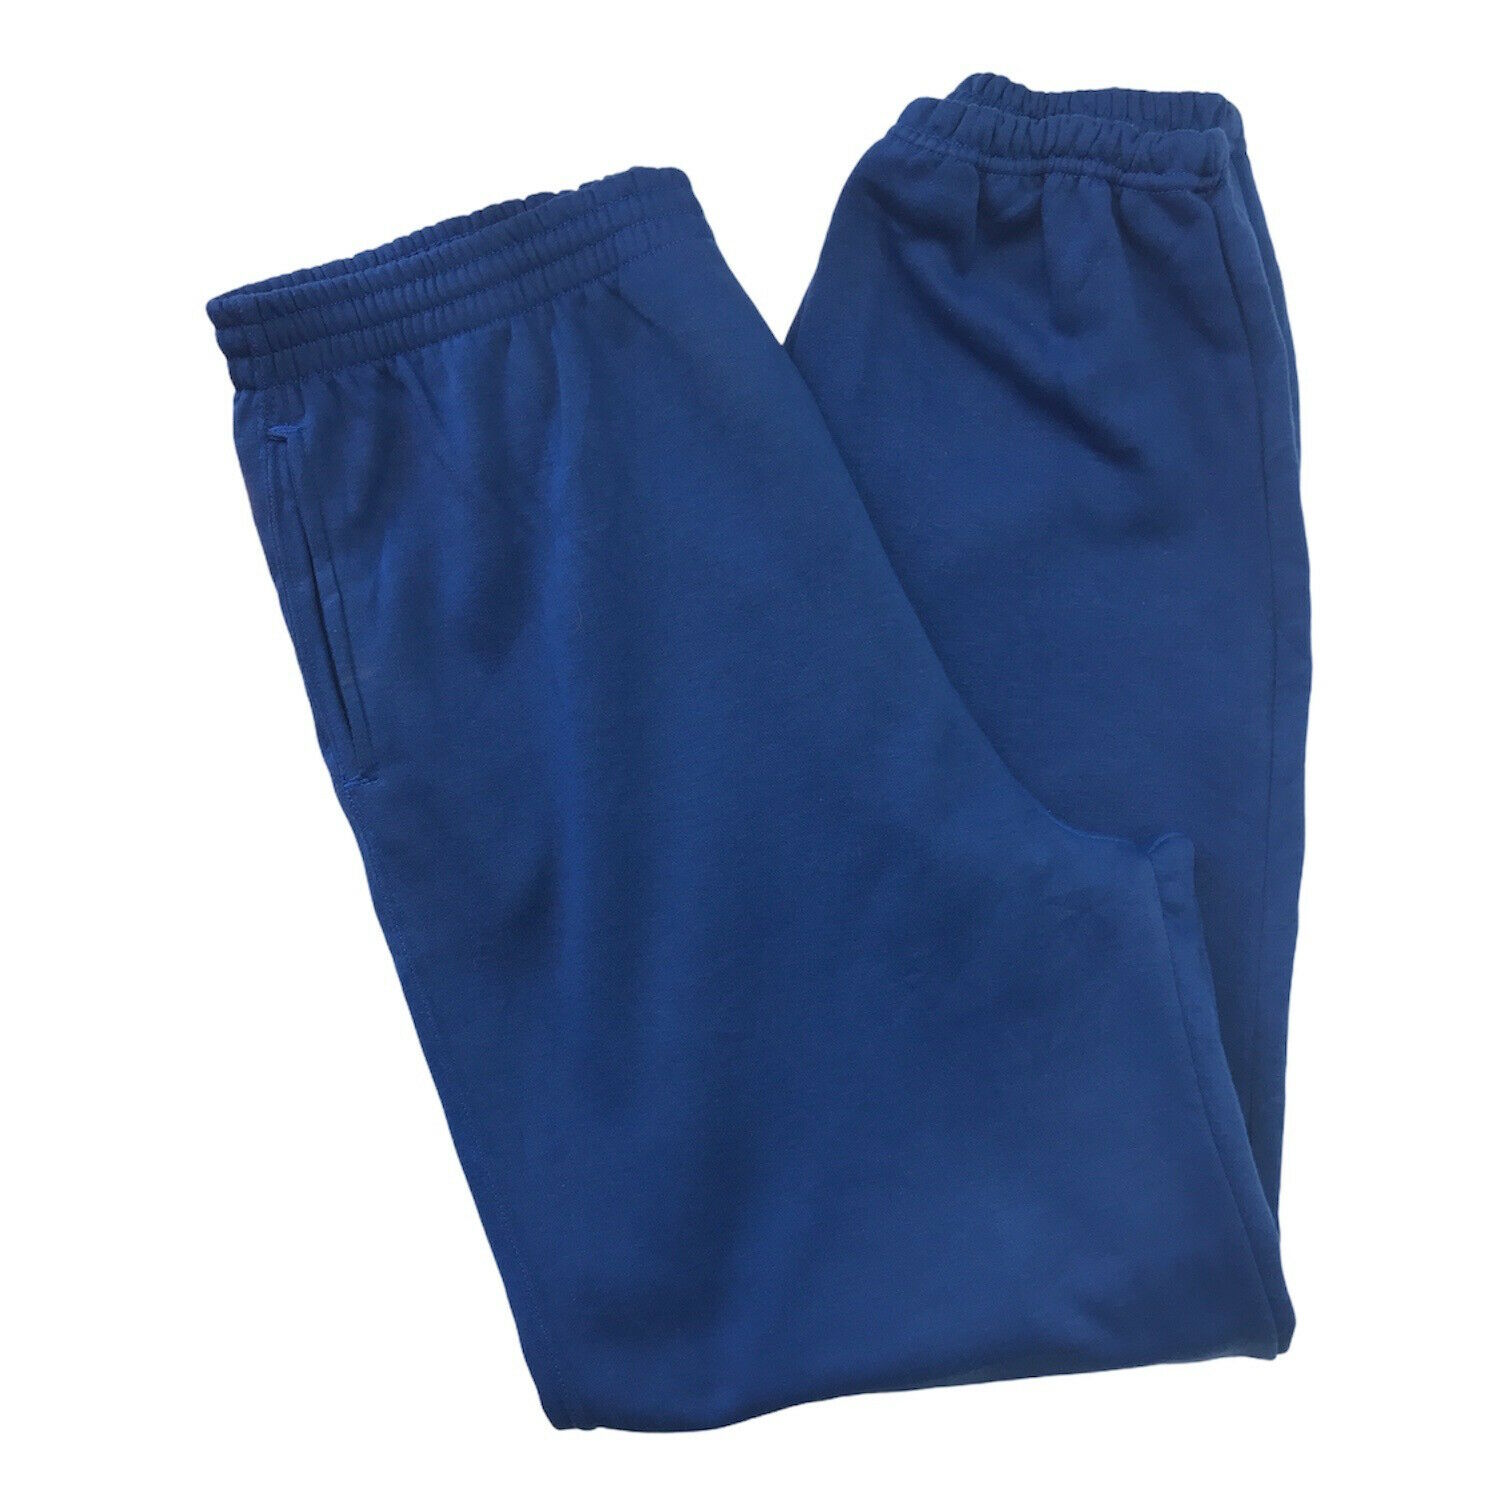 Eddie Bauer Men's Track Bottoms Joggers Blue Size: Large Side Pockets Gym